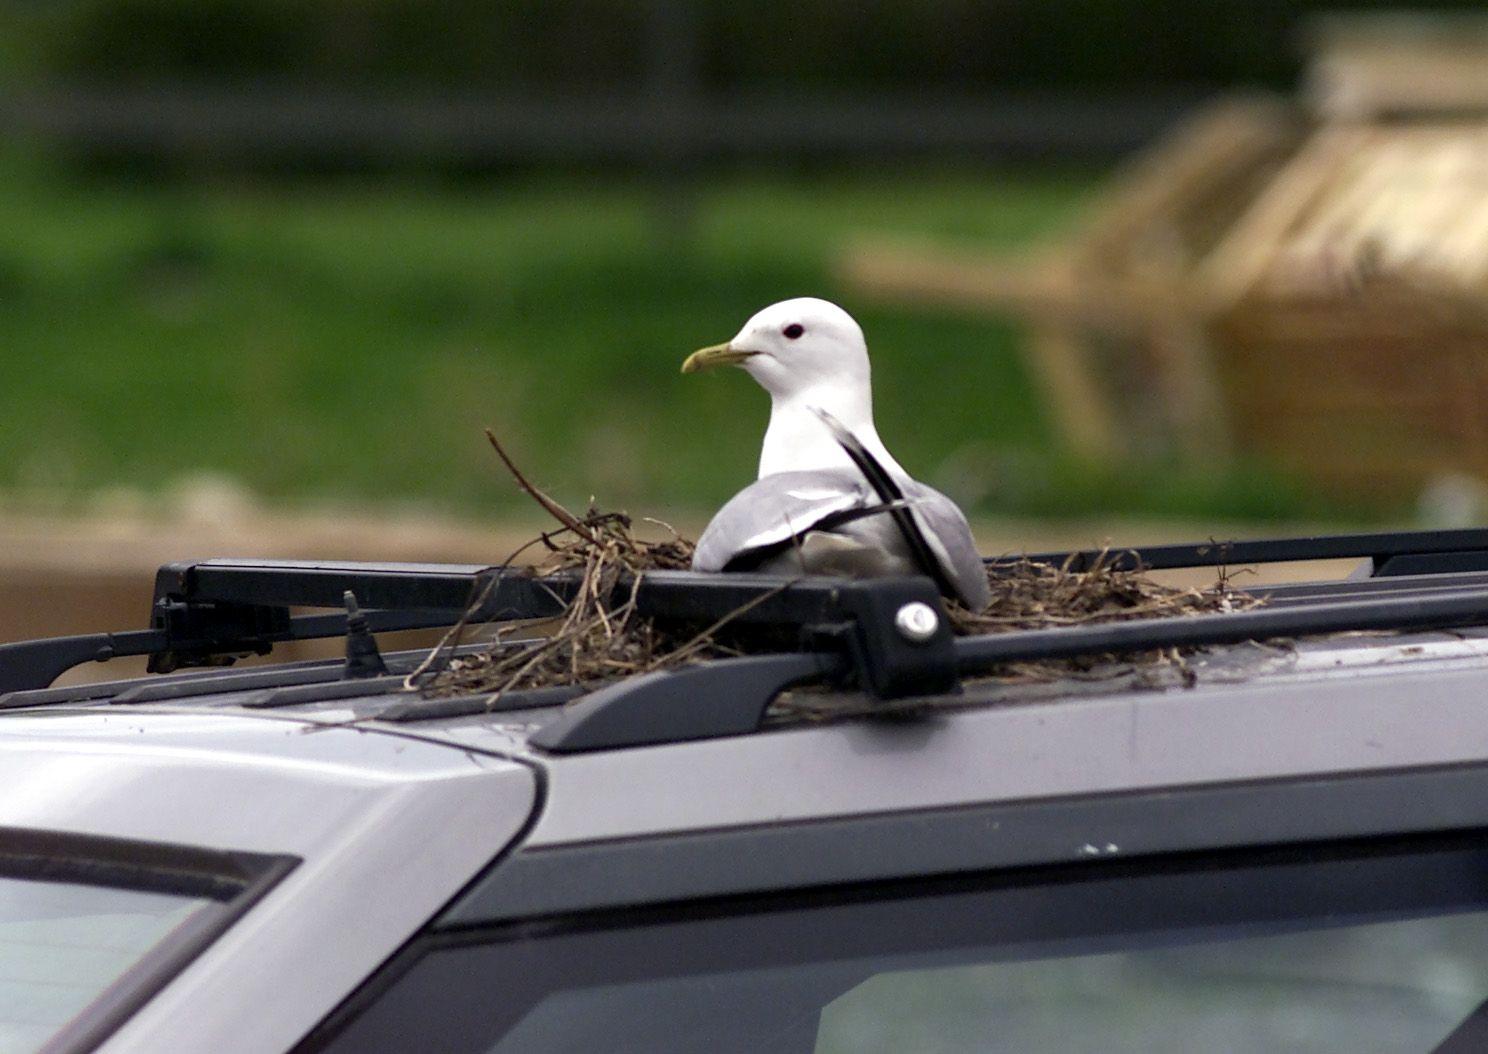 FREDET: En fiskemåke ruger på eggene sine i et rede den har bygget på et biltak på Lade i Trondheim. Illustrasjonsfoto: